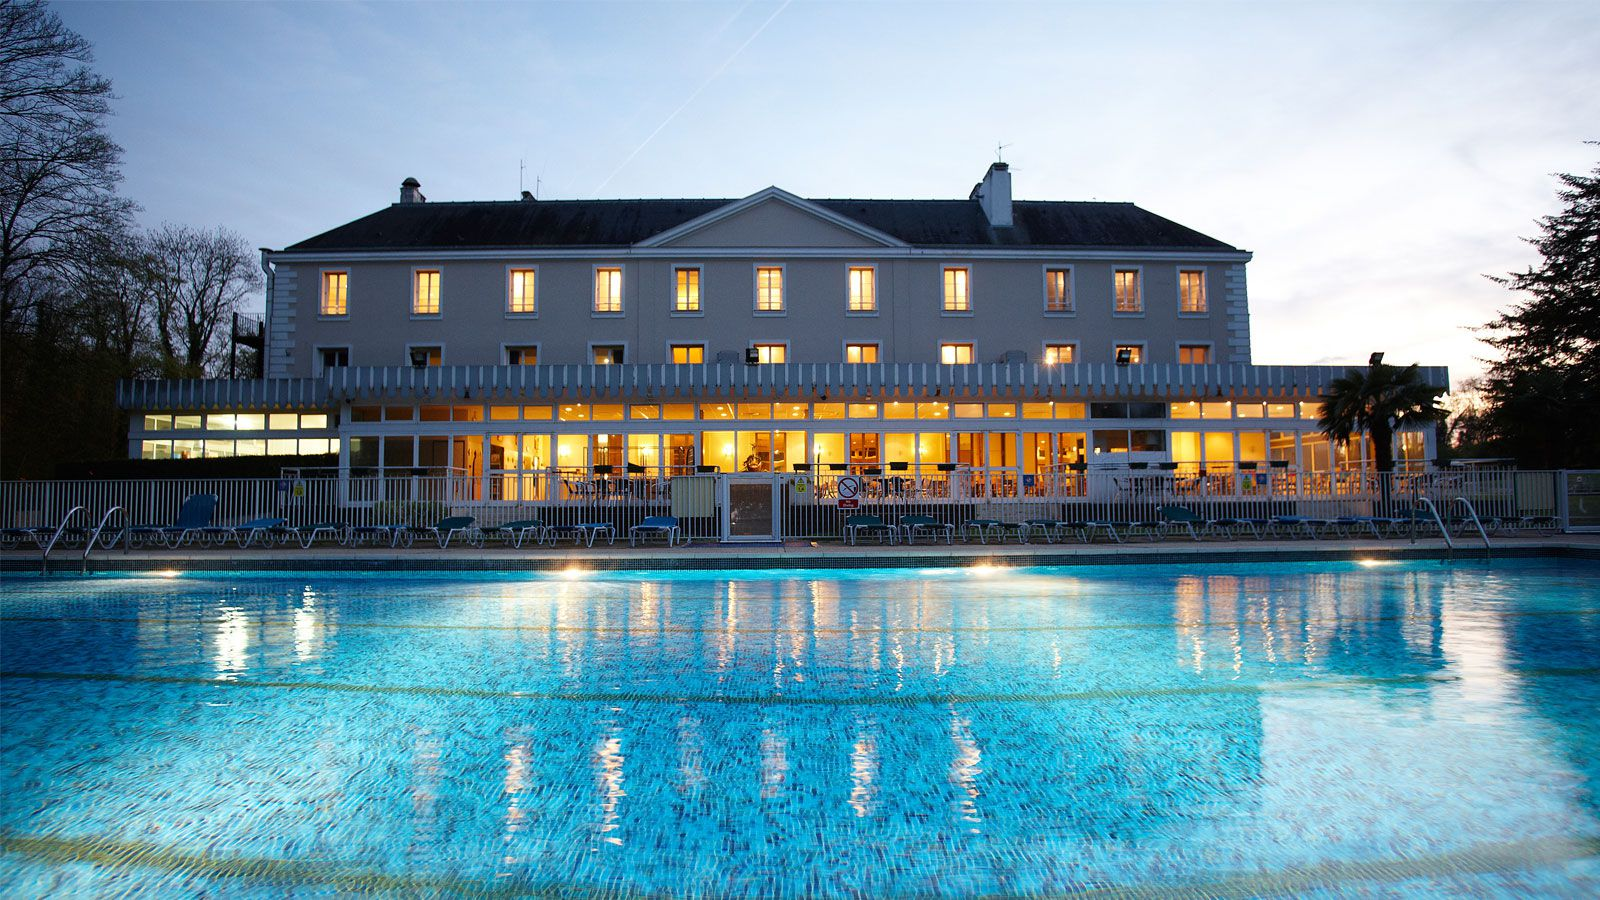 Ch teau de grande romaine secondary school trips to paris for Outdoor swimming in paris